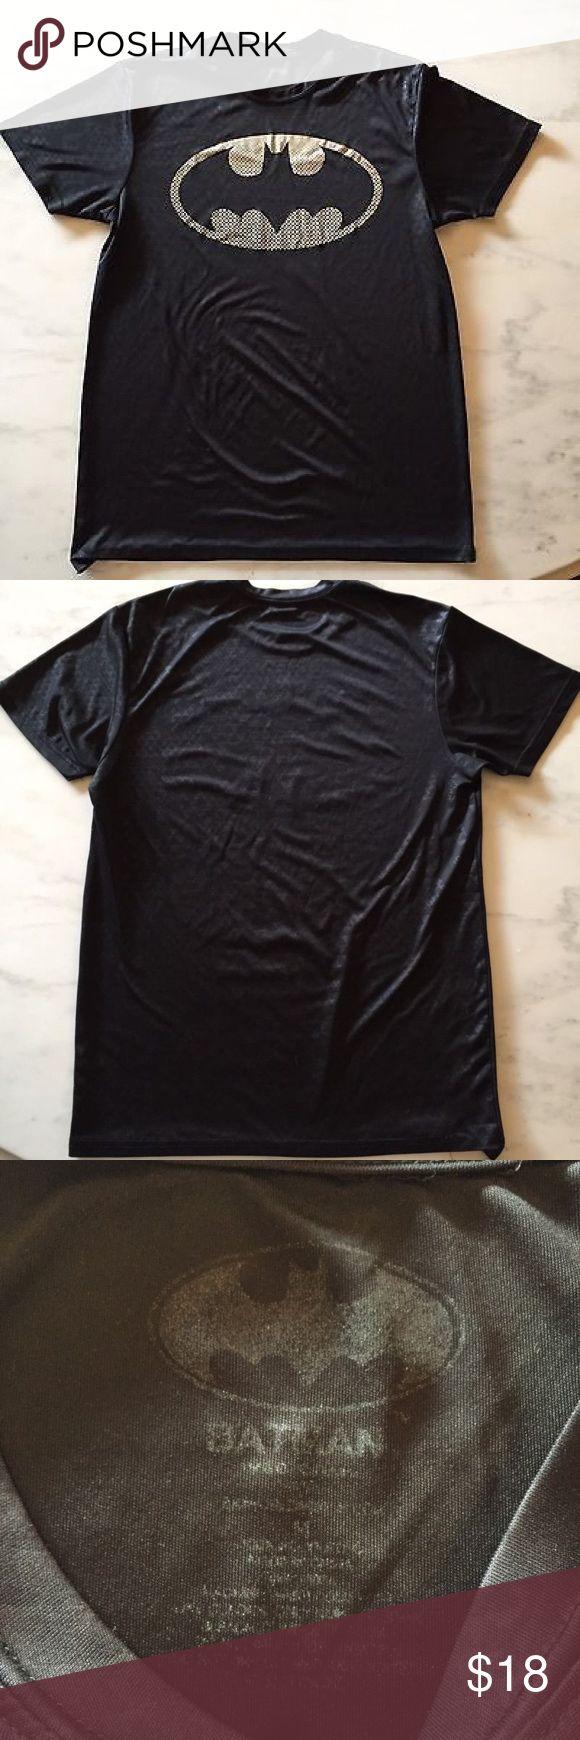 "Batman T-shirt Sport Unisex Gotham City Black Batman Unisex t-shirt.  This fabric is similar to spandex/gore-tex. I cannot say for certain.  • Size Medium.  • Measurements:  • Armpit to armpit 20"".  • Shoulder to shoulder: 17"".  • Length from shoulder to bottom: 27 1/2"".  • Fantastic condition! Batman Shirts"